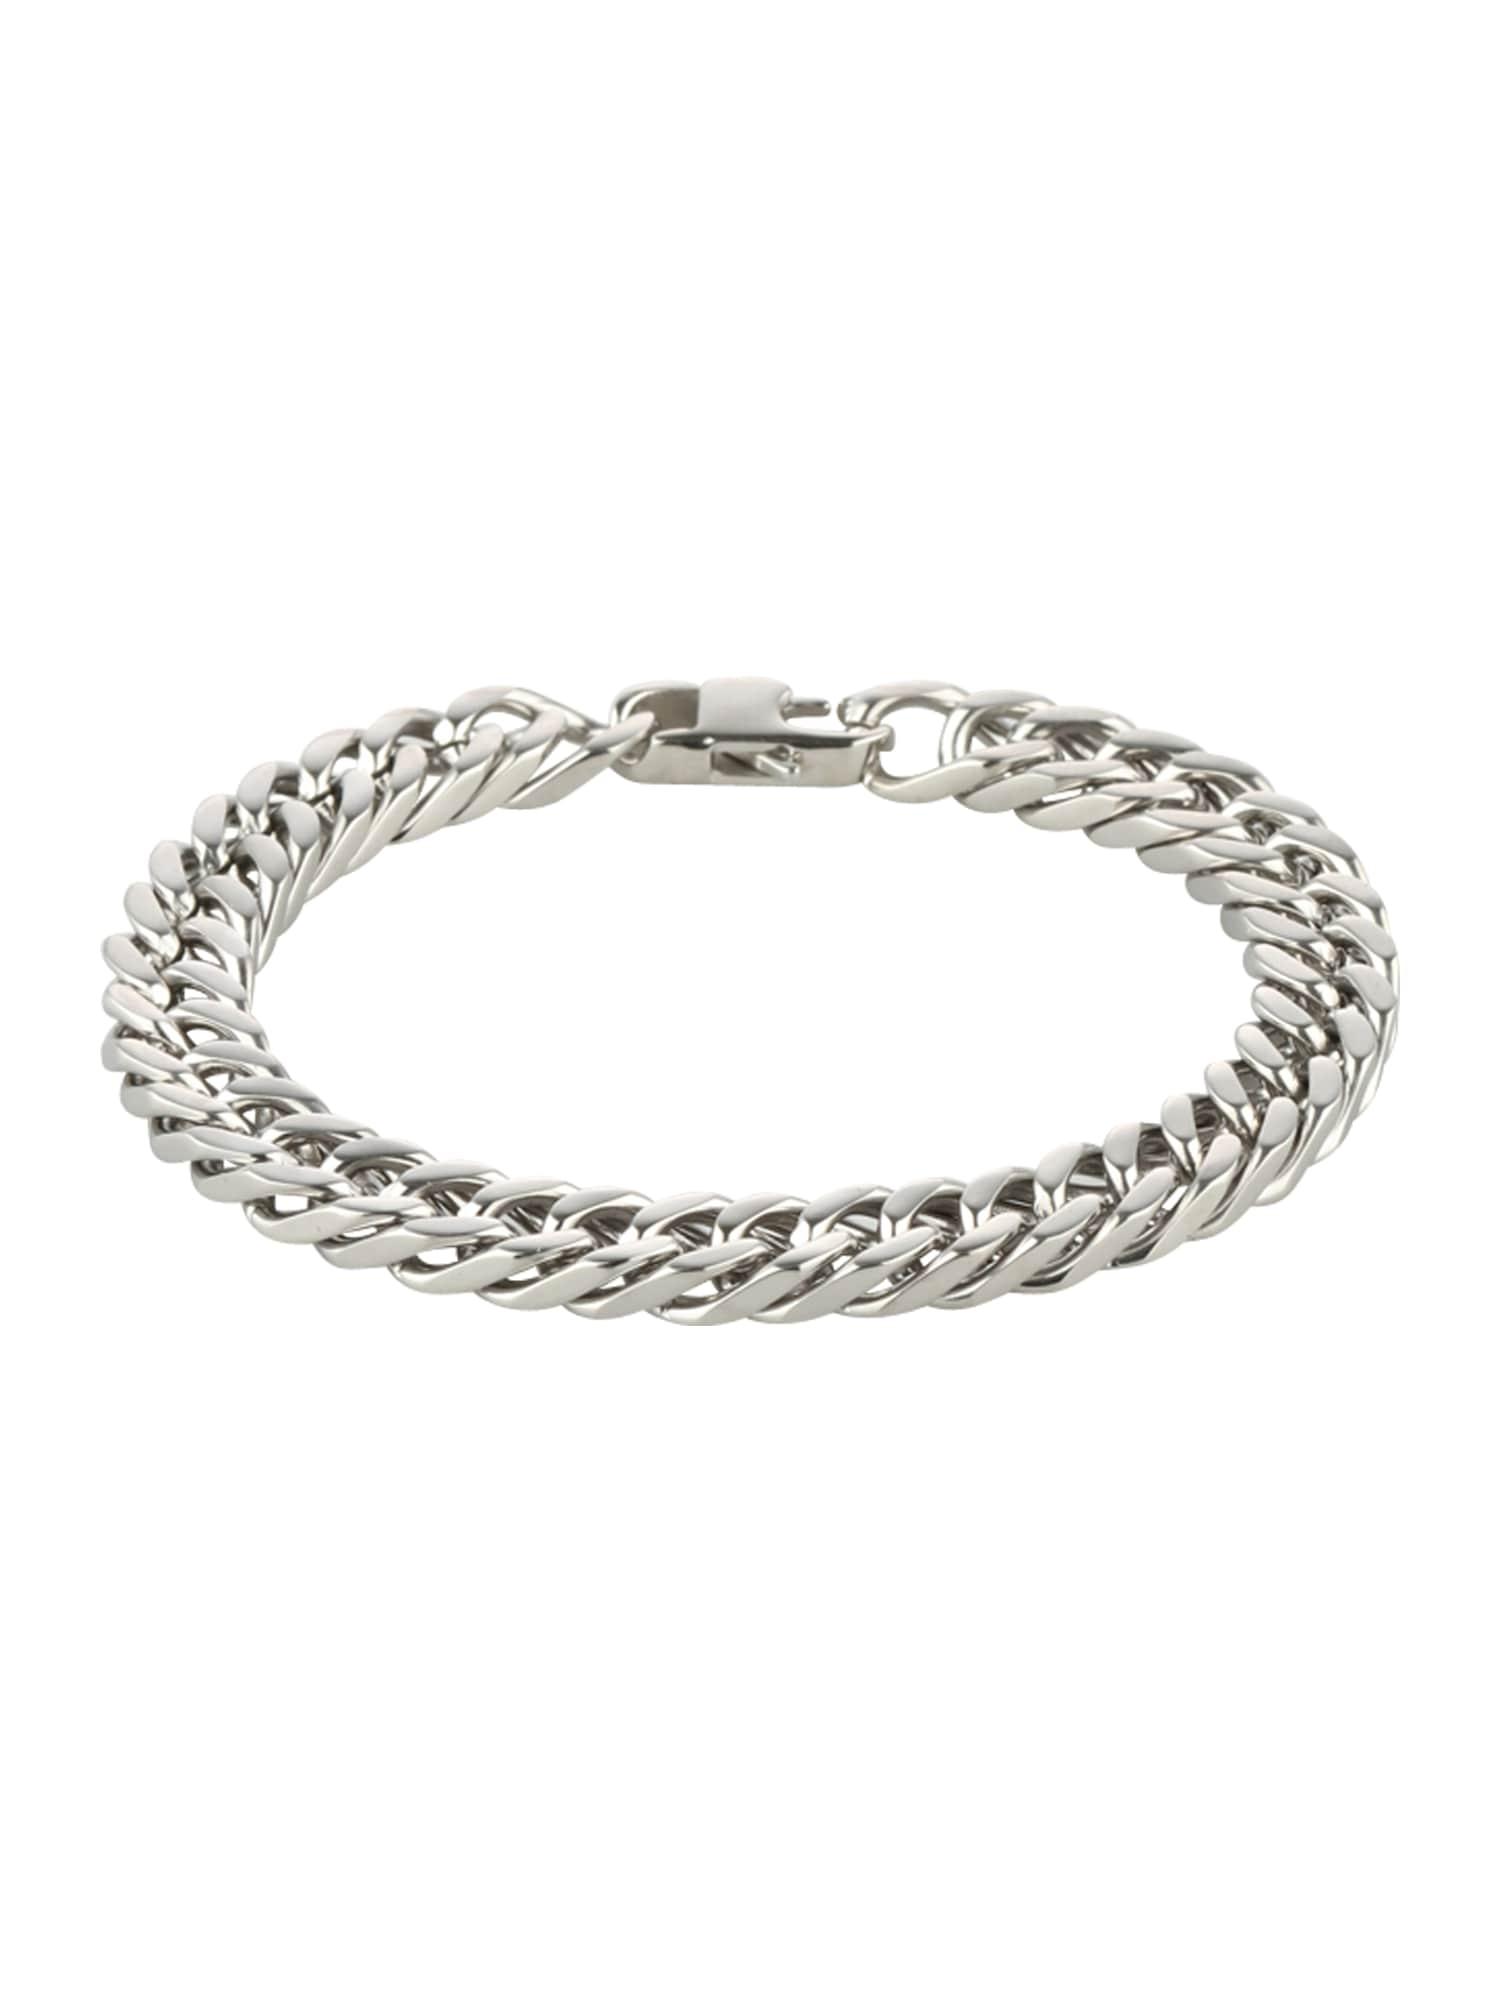 Náramek Bracelet Classic Line II stříbrná ROYAL-EGO